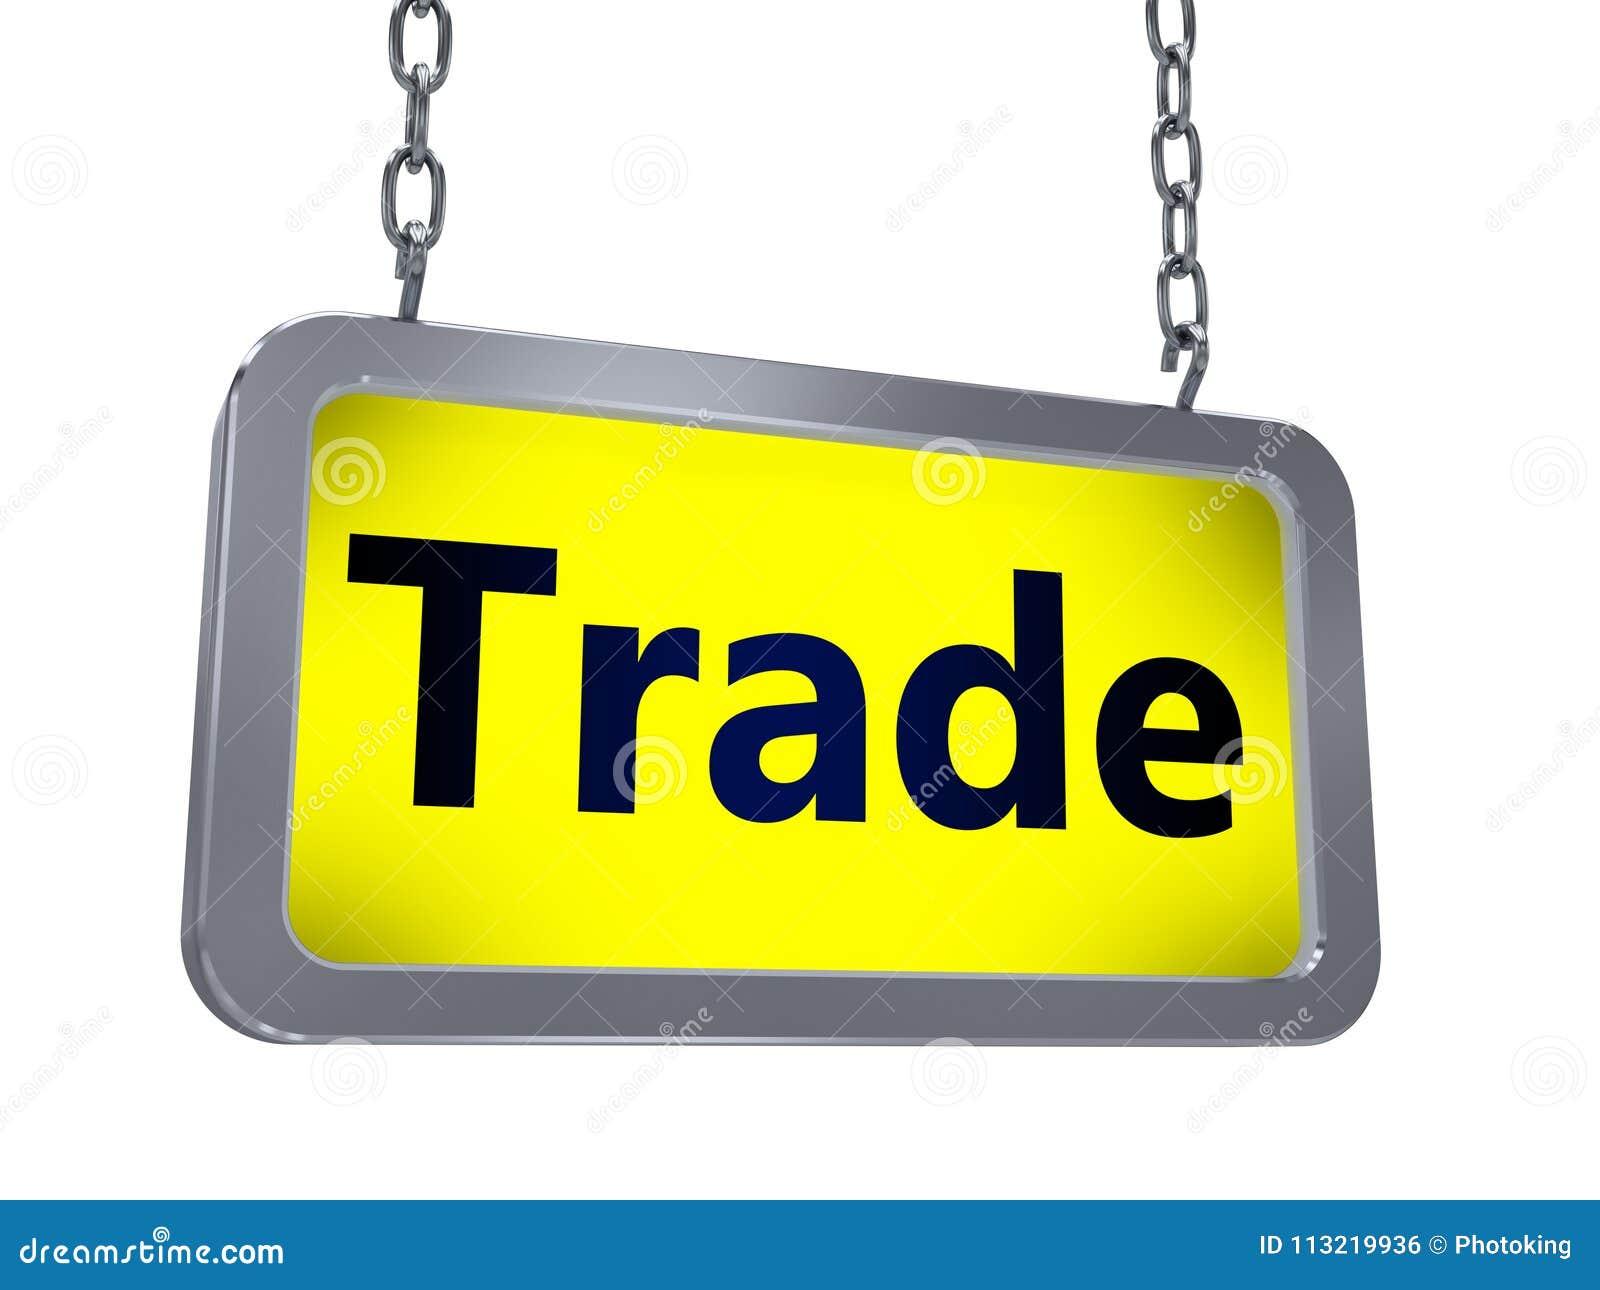 Trade on billboard